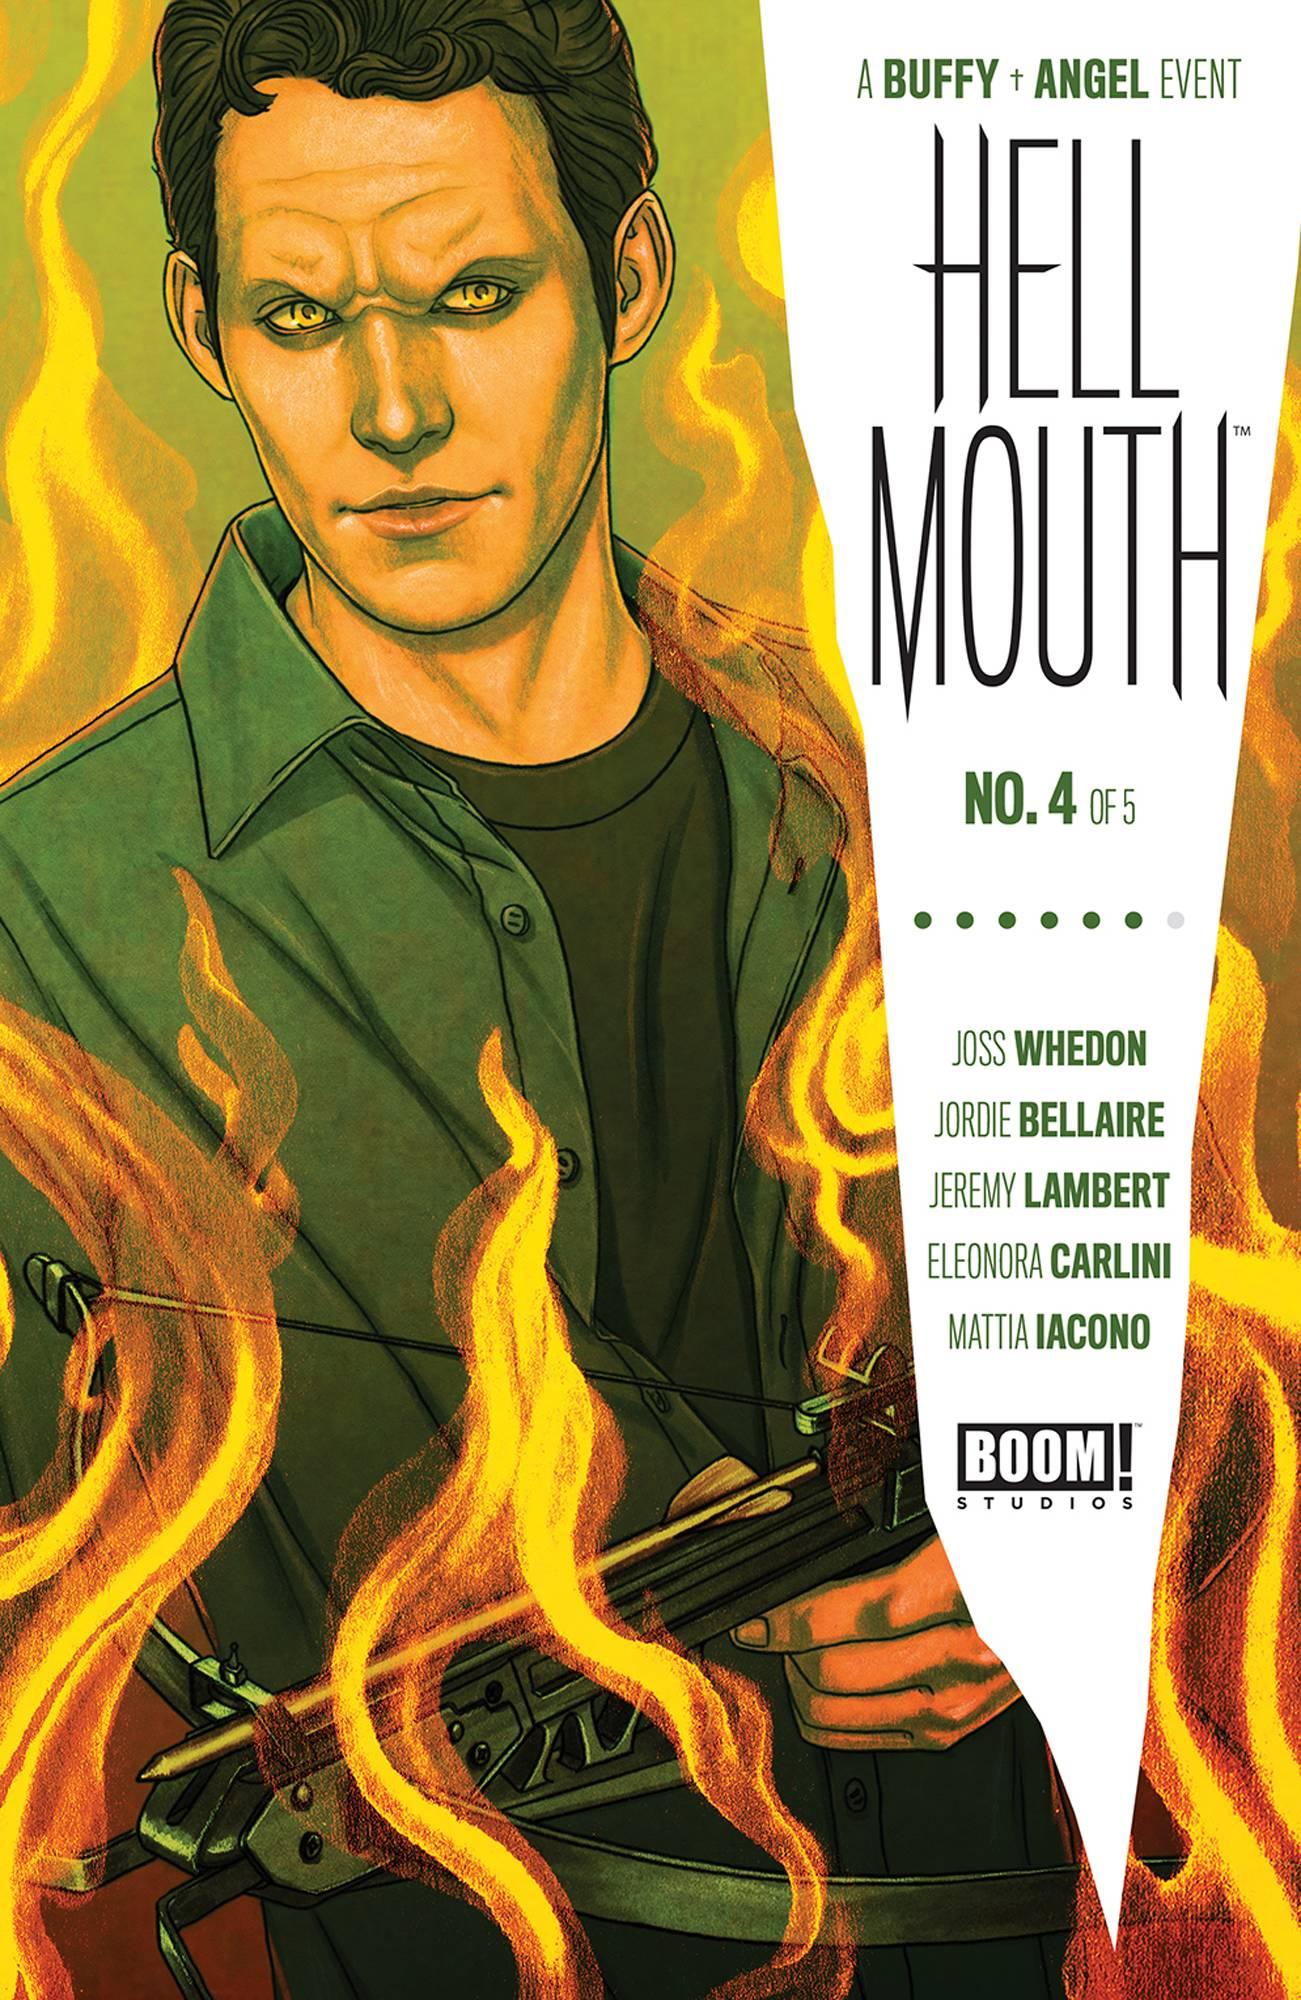 Buffy Vampire Slayer: Angel - Hellmouth #4 (2020)